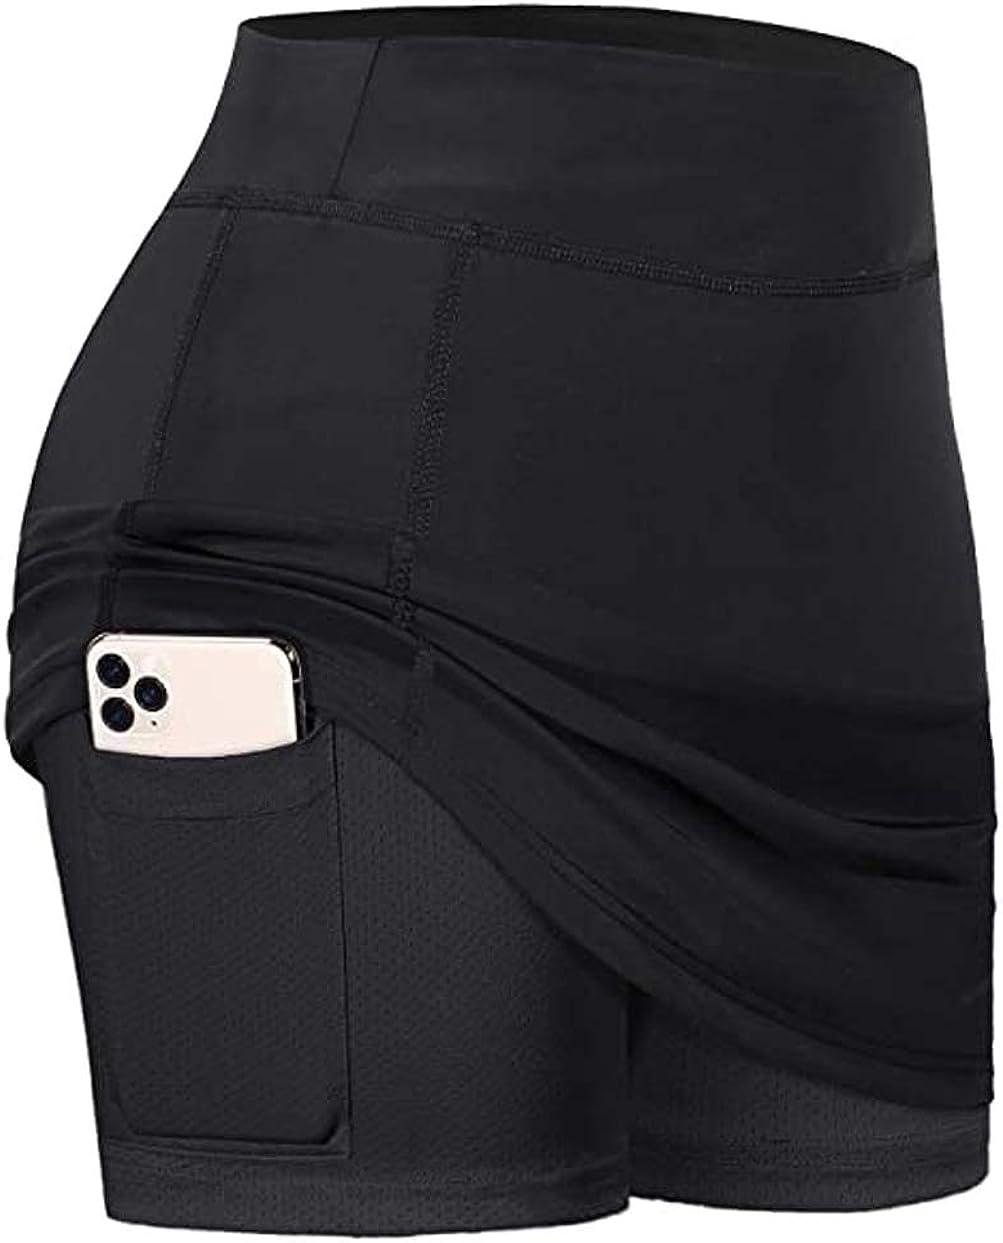 ExQuisite.ZFZ Women's Tennis Skirts Elastic Inner Shorts Sports Running Golf Skorts with Pockets